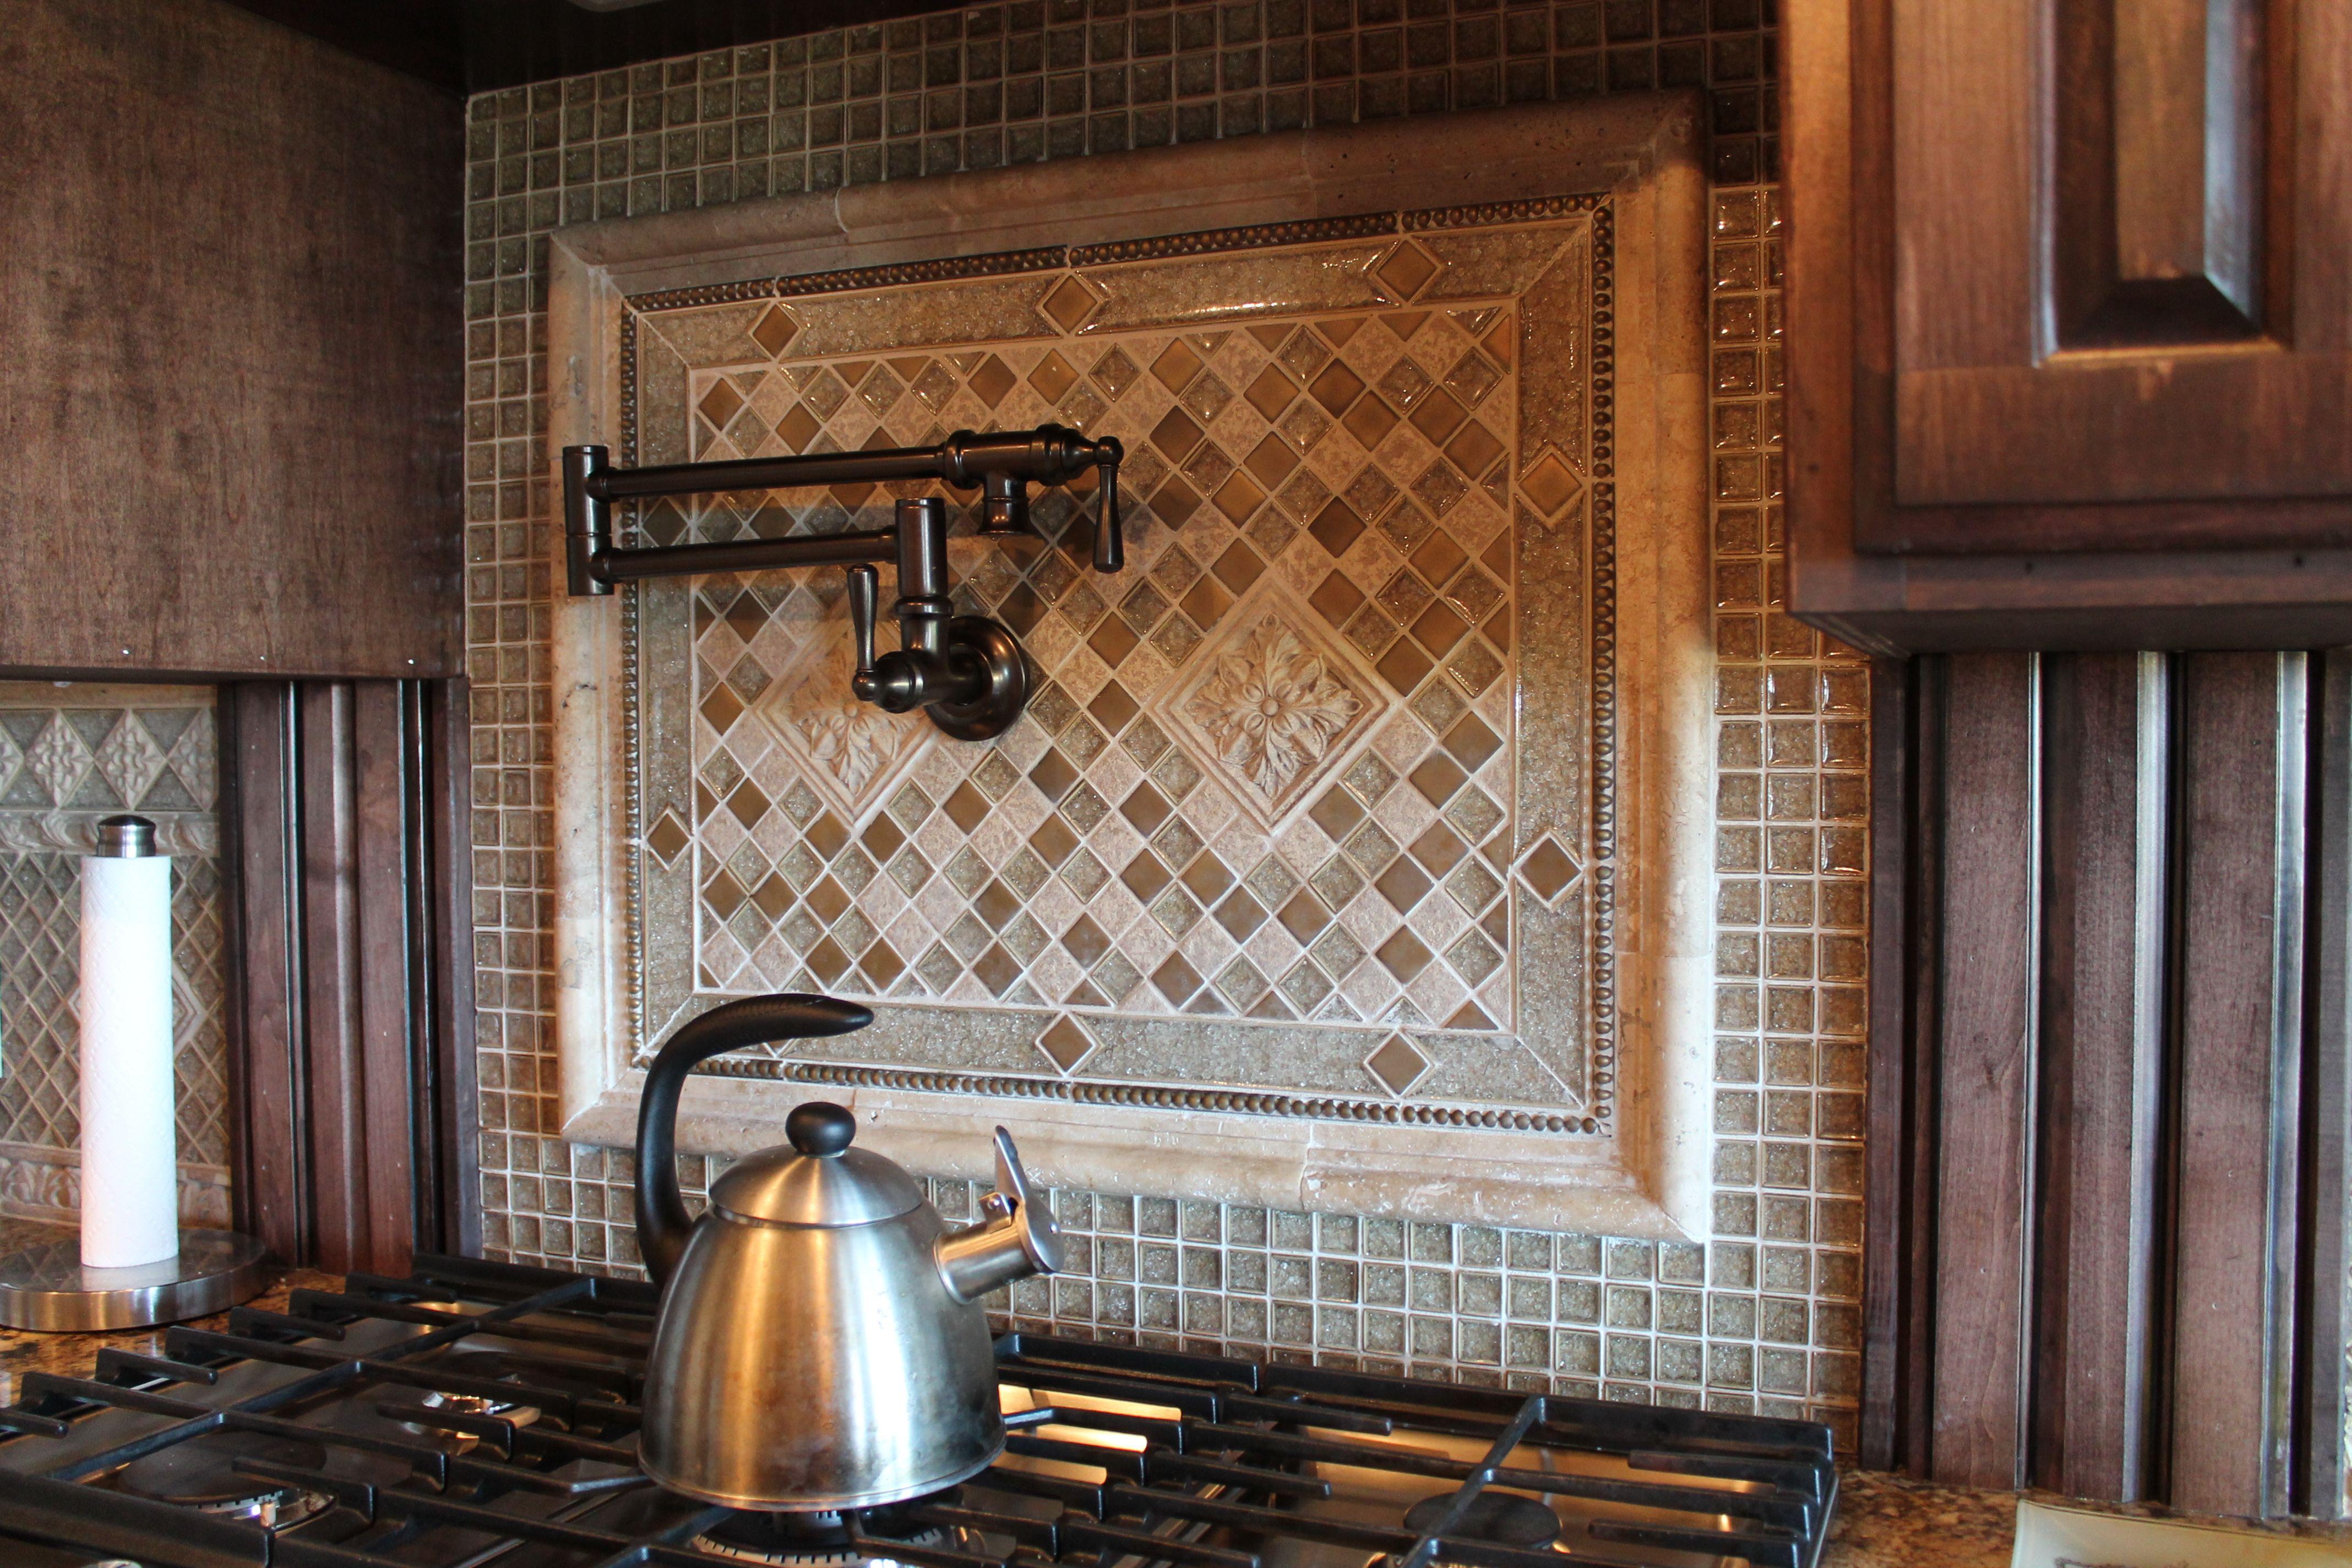 Gl And Ceramic Kitchen Backsplash Design By Tukasa Creations With Sonoma Tile